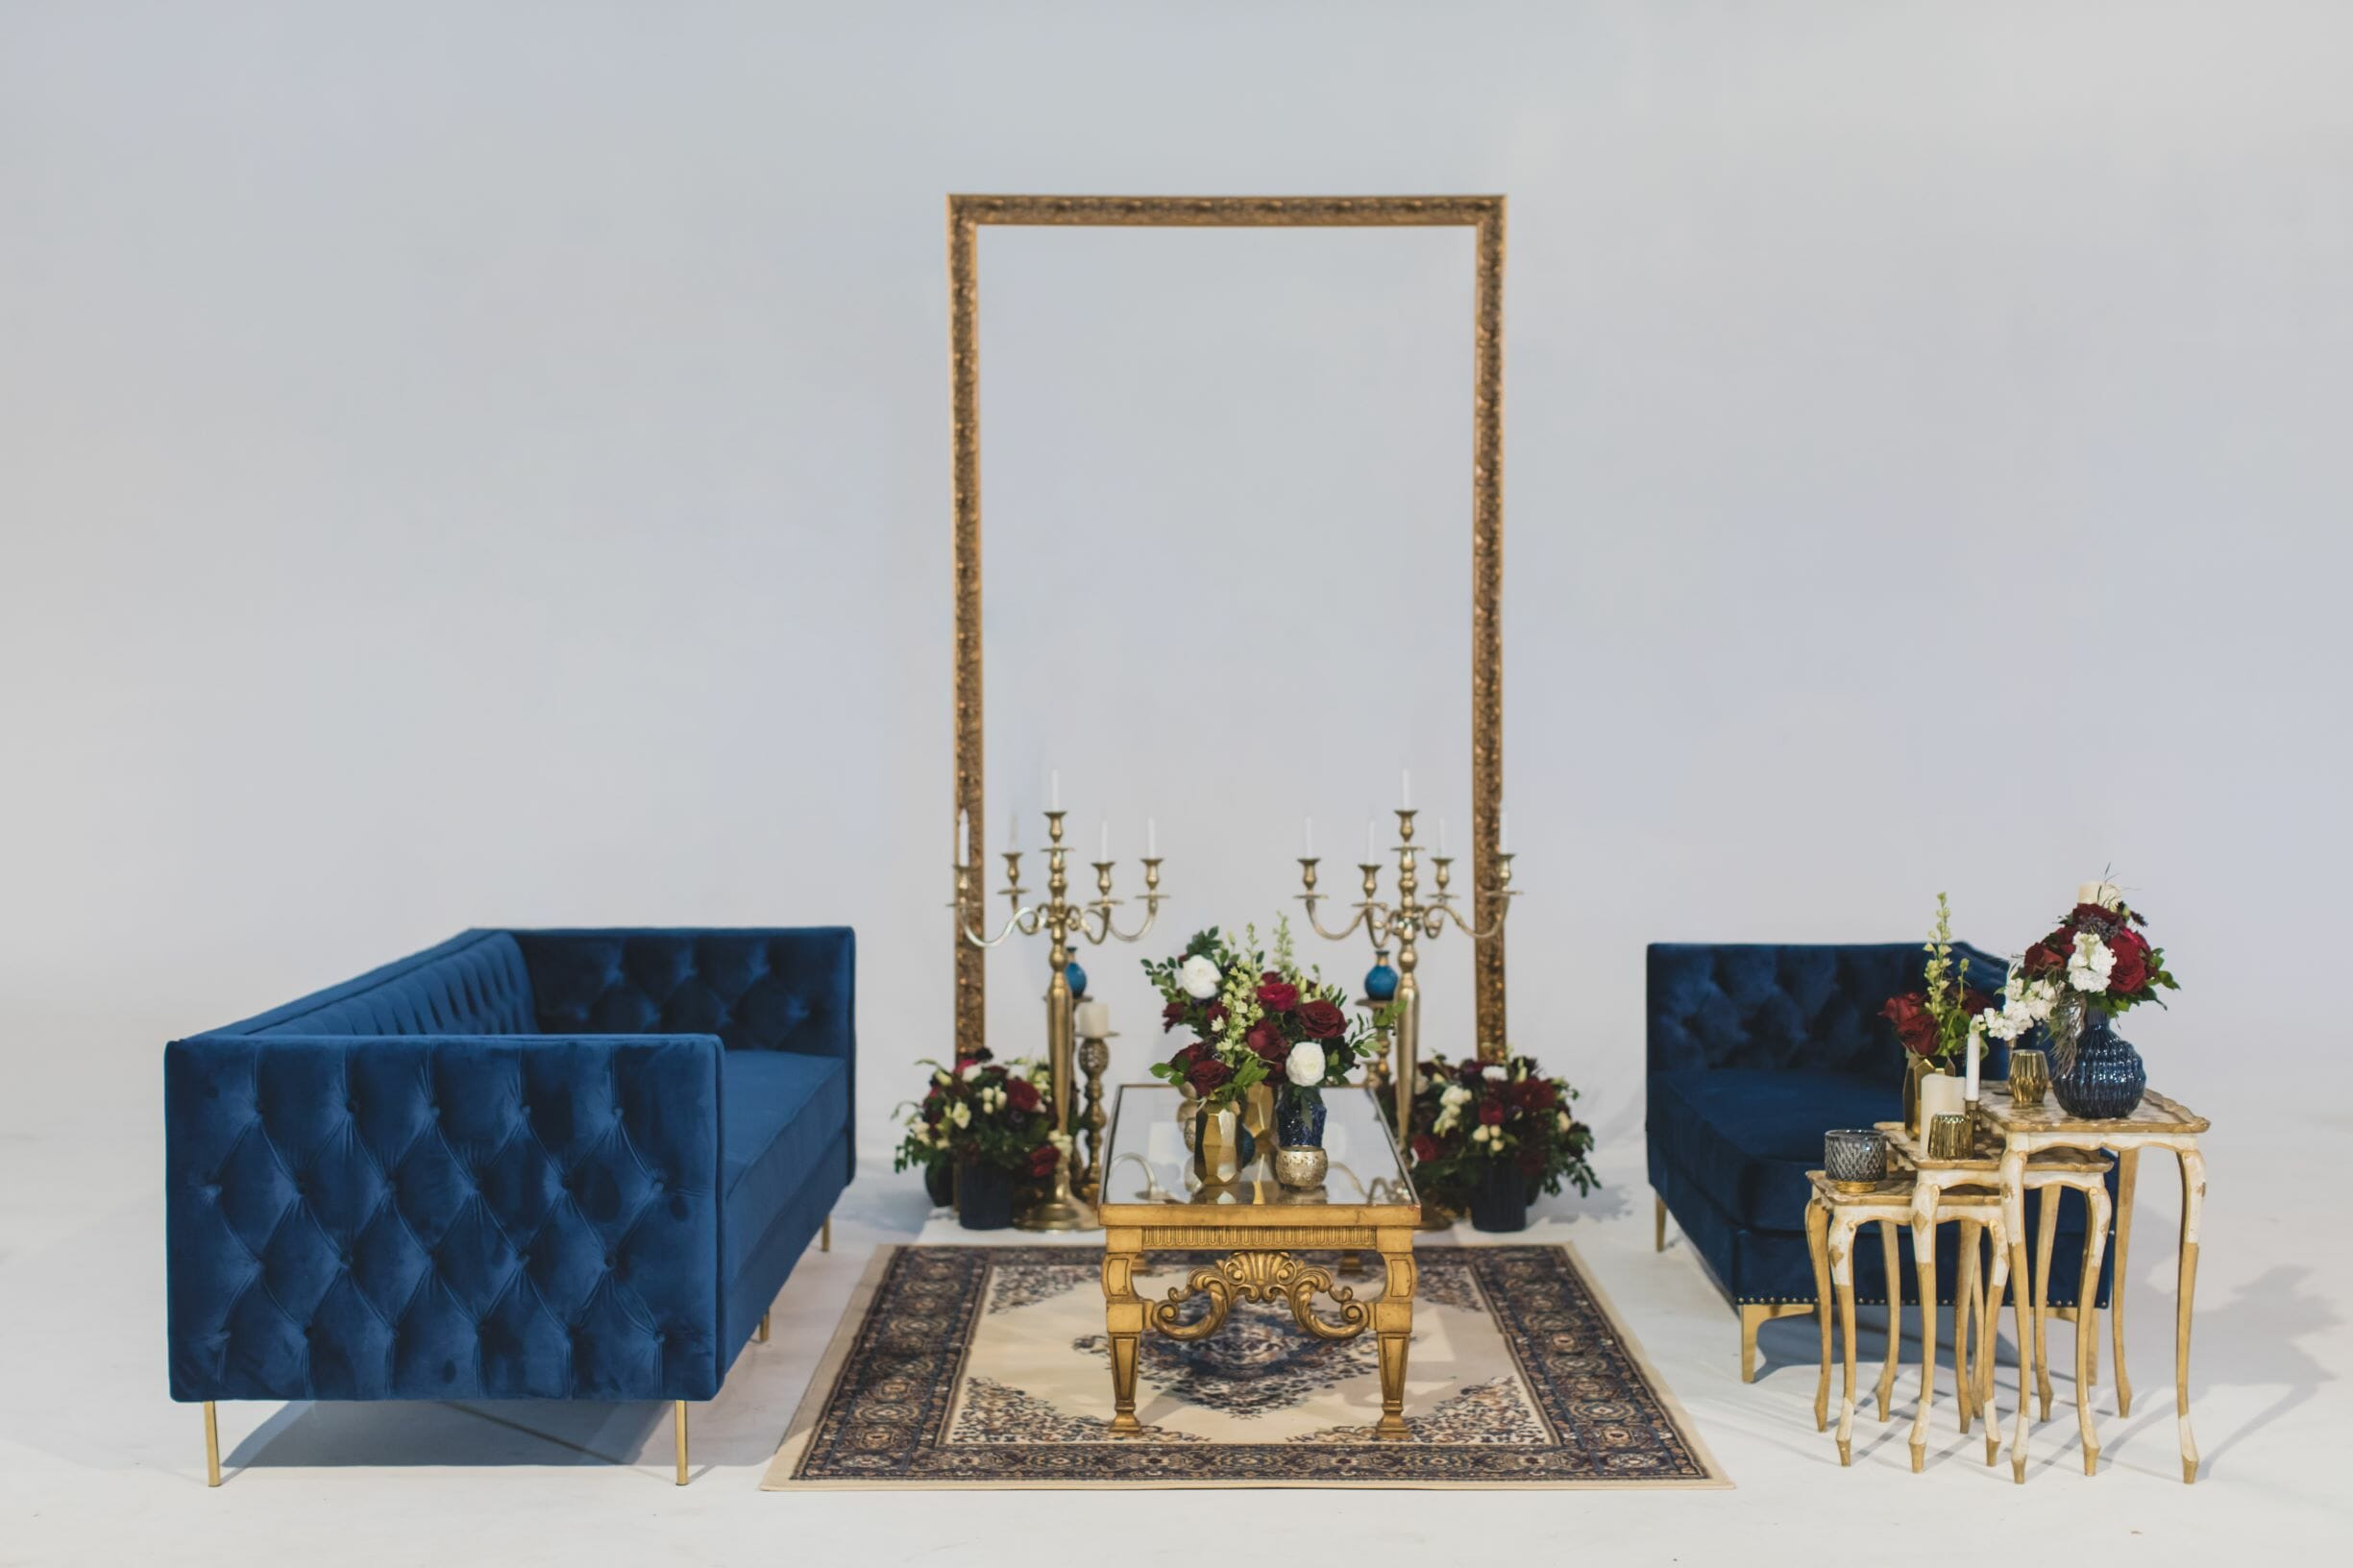 jewel_tone-Lounge_rental_orlando